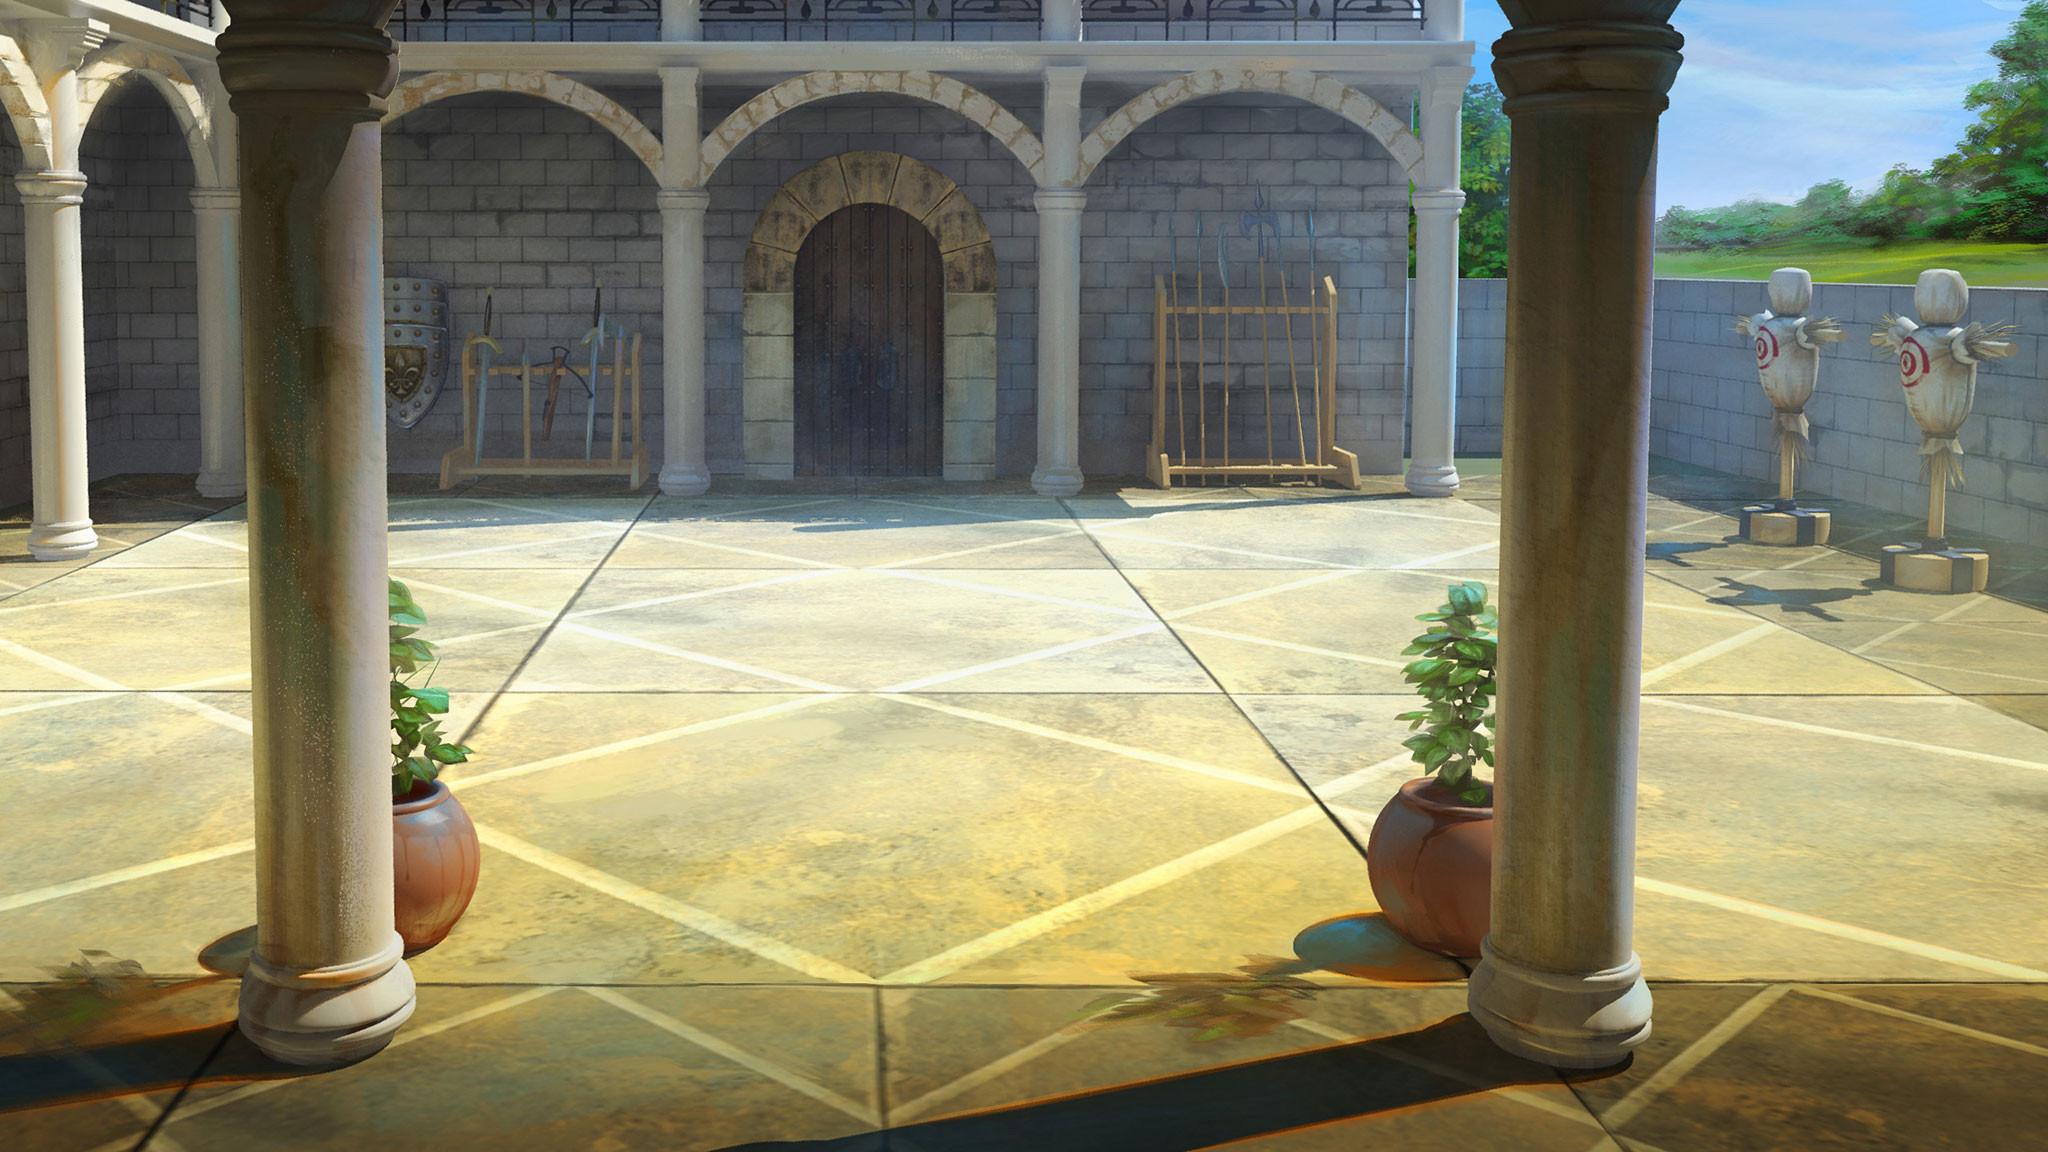 The Training Courtyard